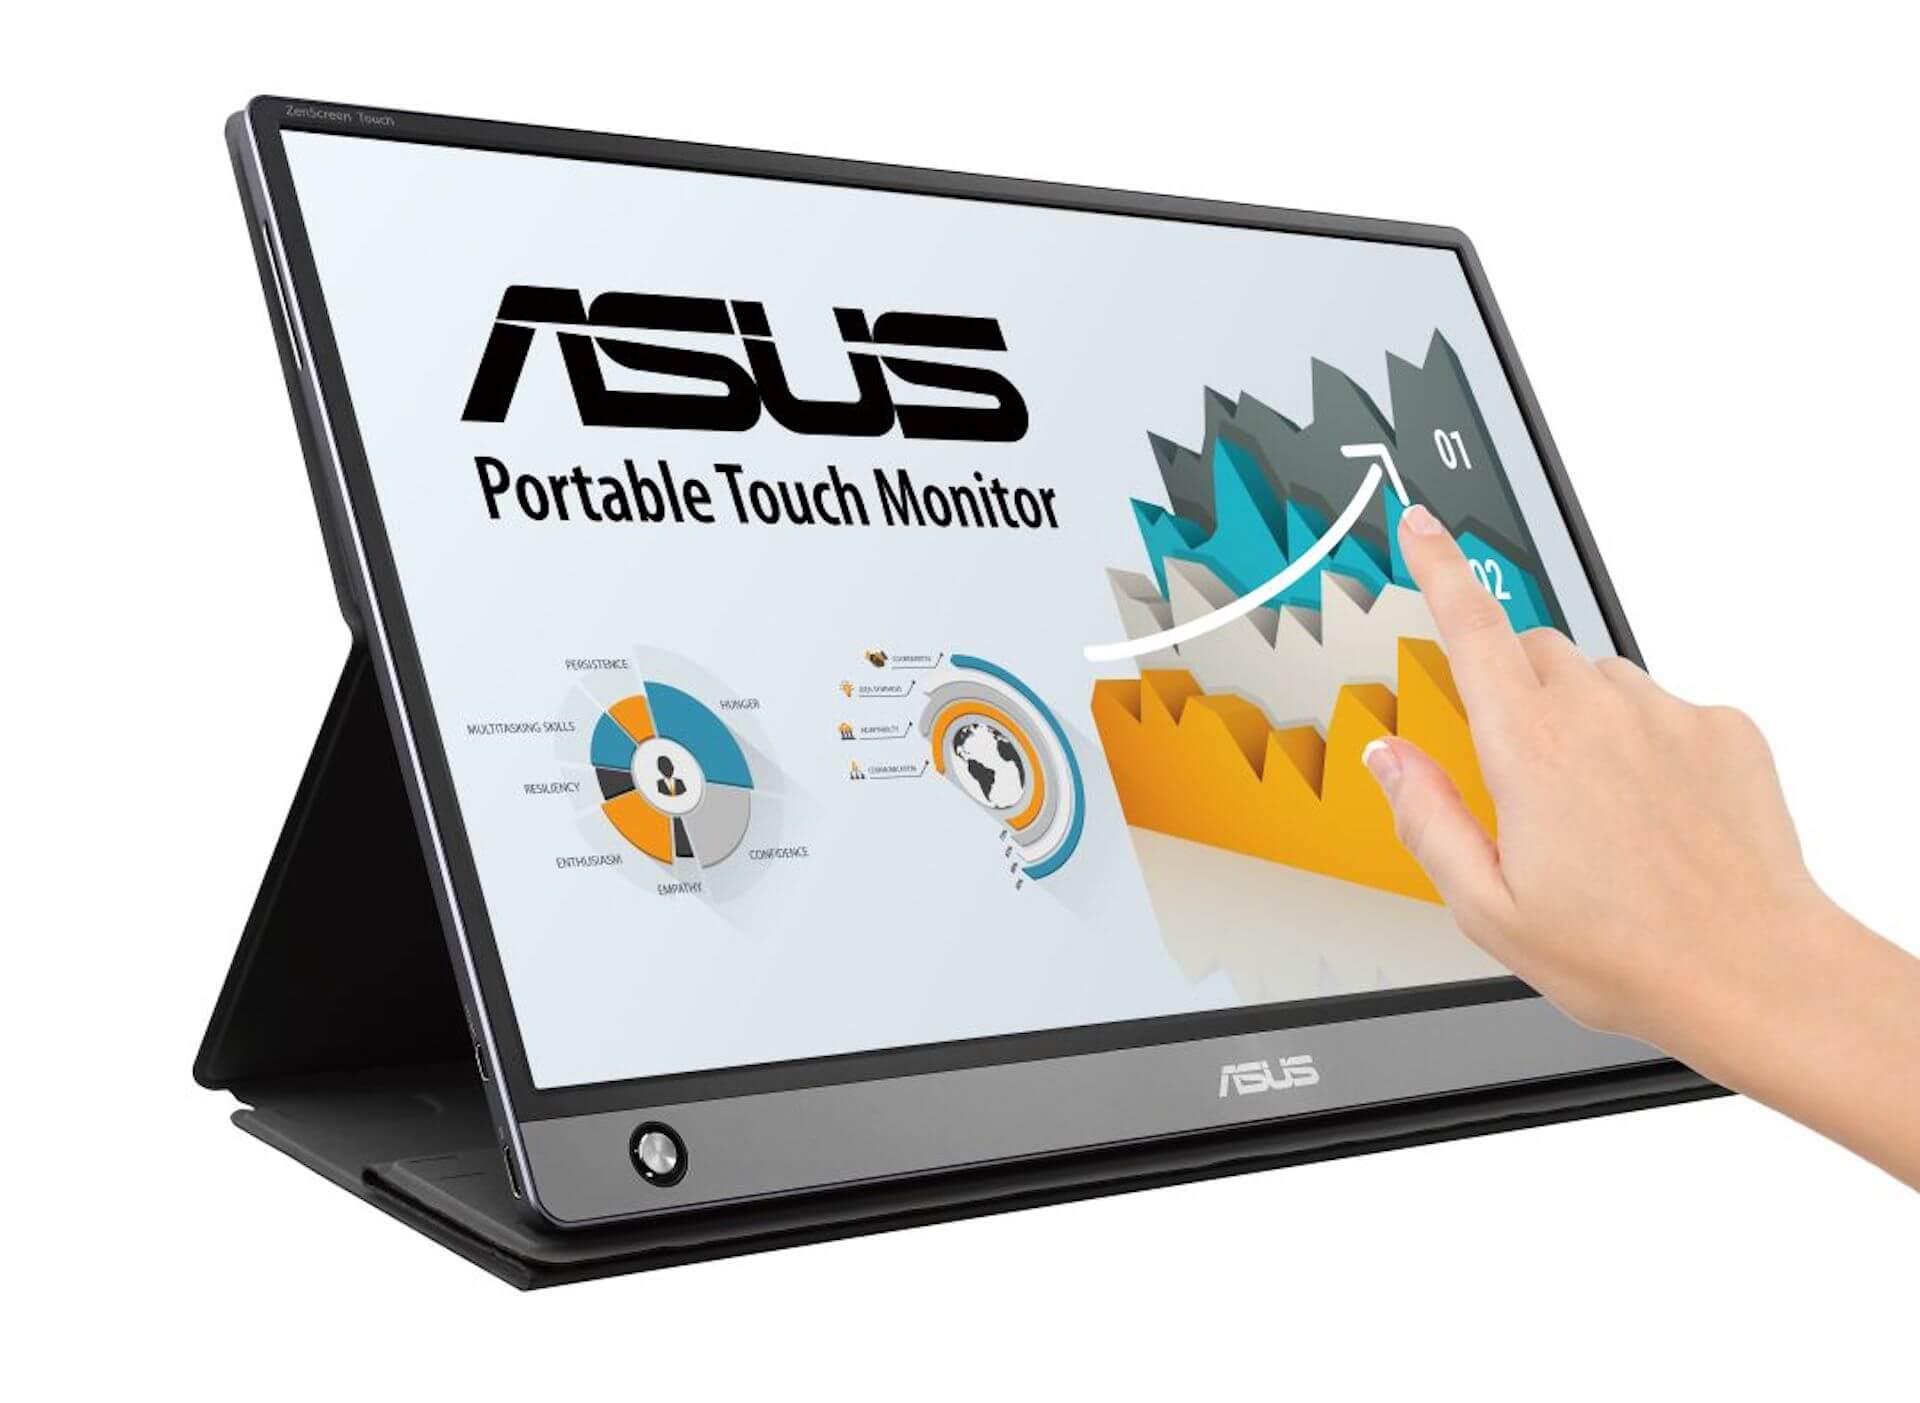 USB-C&micro HDMI端子搭載!わずか9mmの超薄型ディスプレイ2製品がASUSから登場 tech190918_asus_display_main